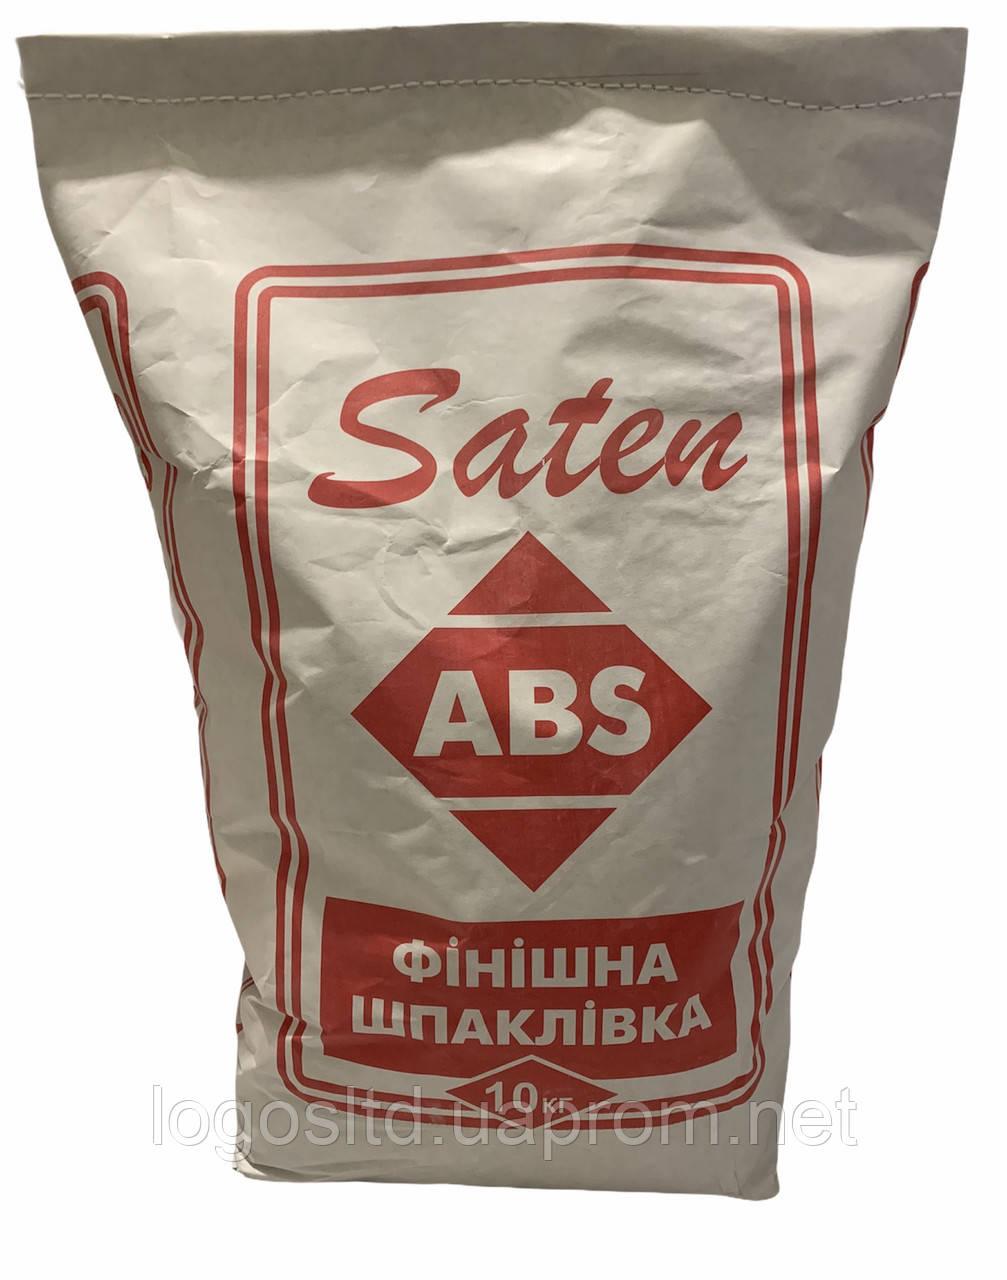 Шпатлевка АВС финишная  10 кг (Турция)